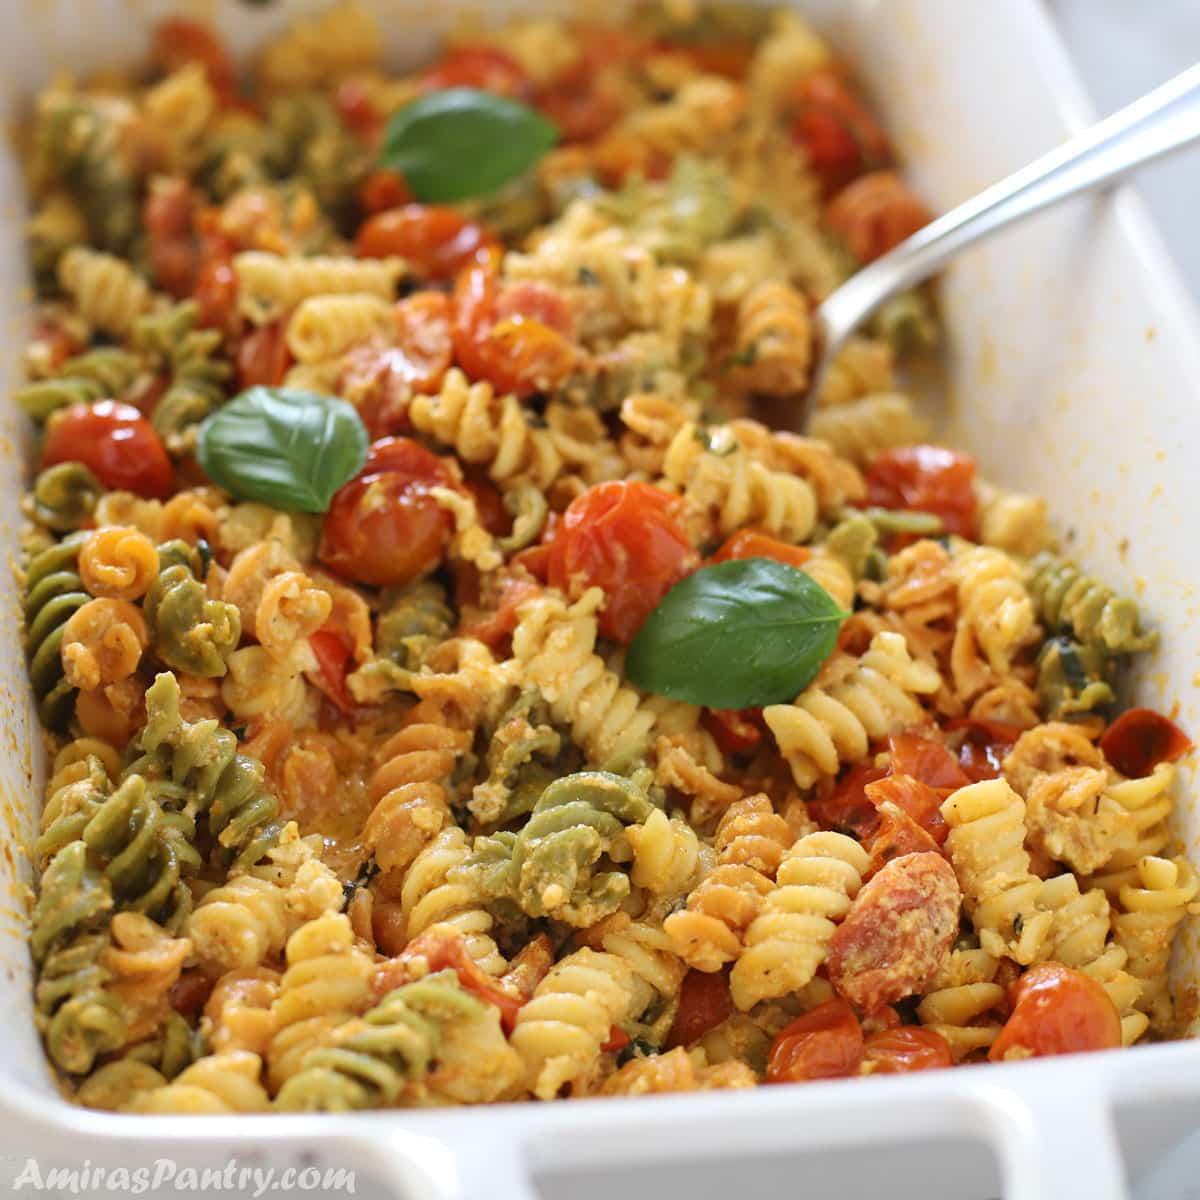 Feta pasta in a white casserole dish with a spoon in it.